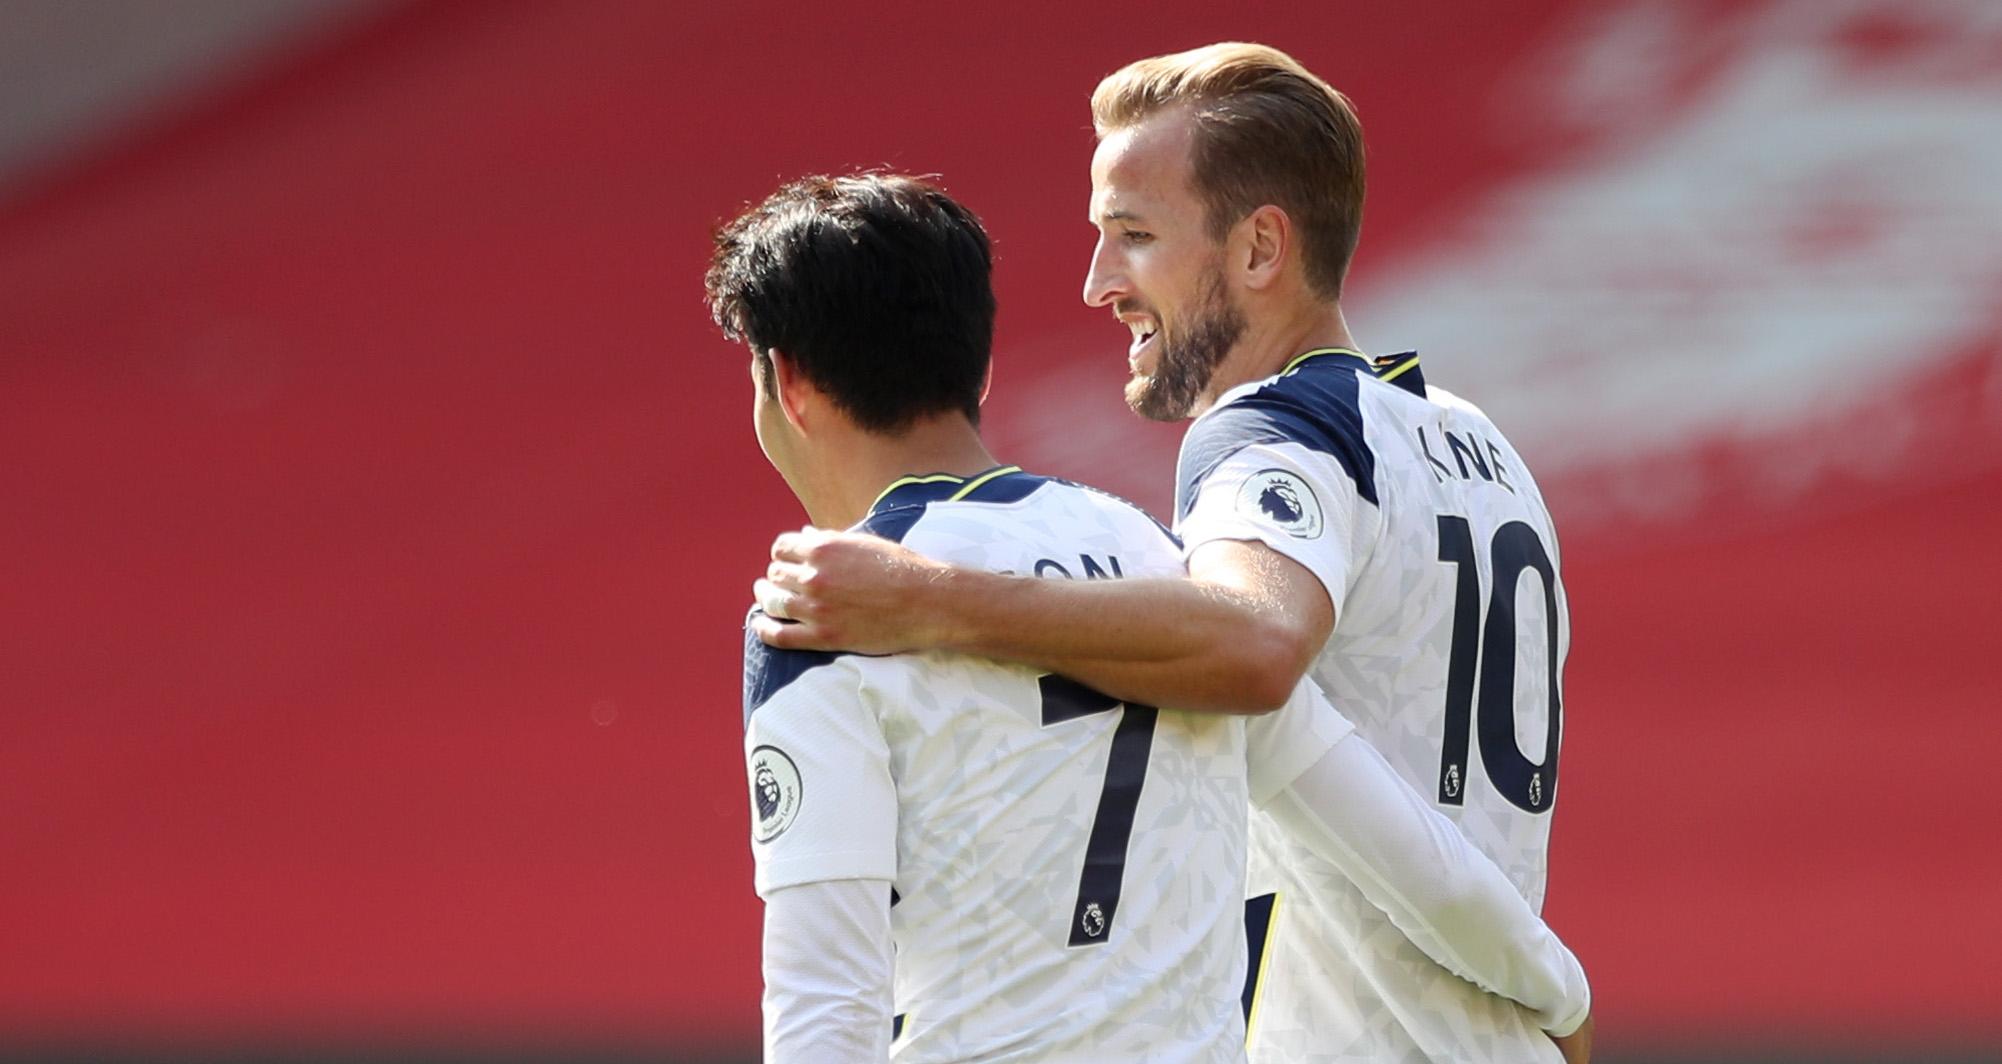 Angleterre : l'incroyable exploit du duo Son Heung-Min - Harry Kane avec Tottenham